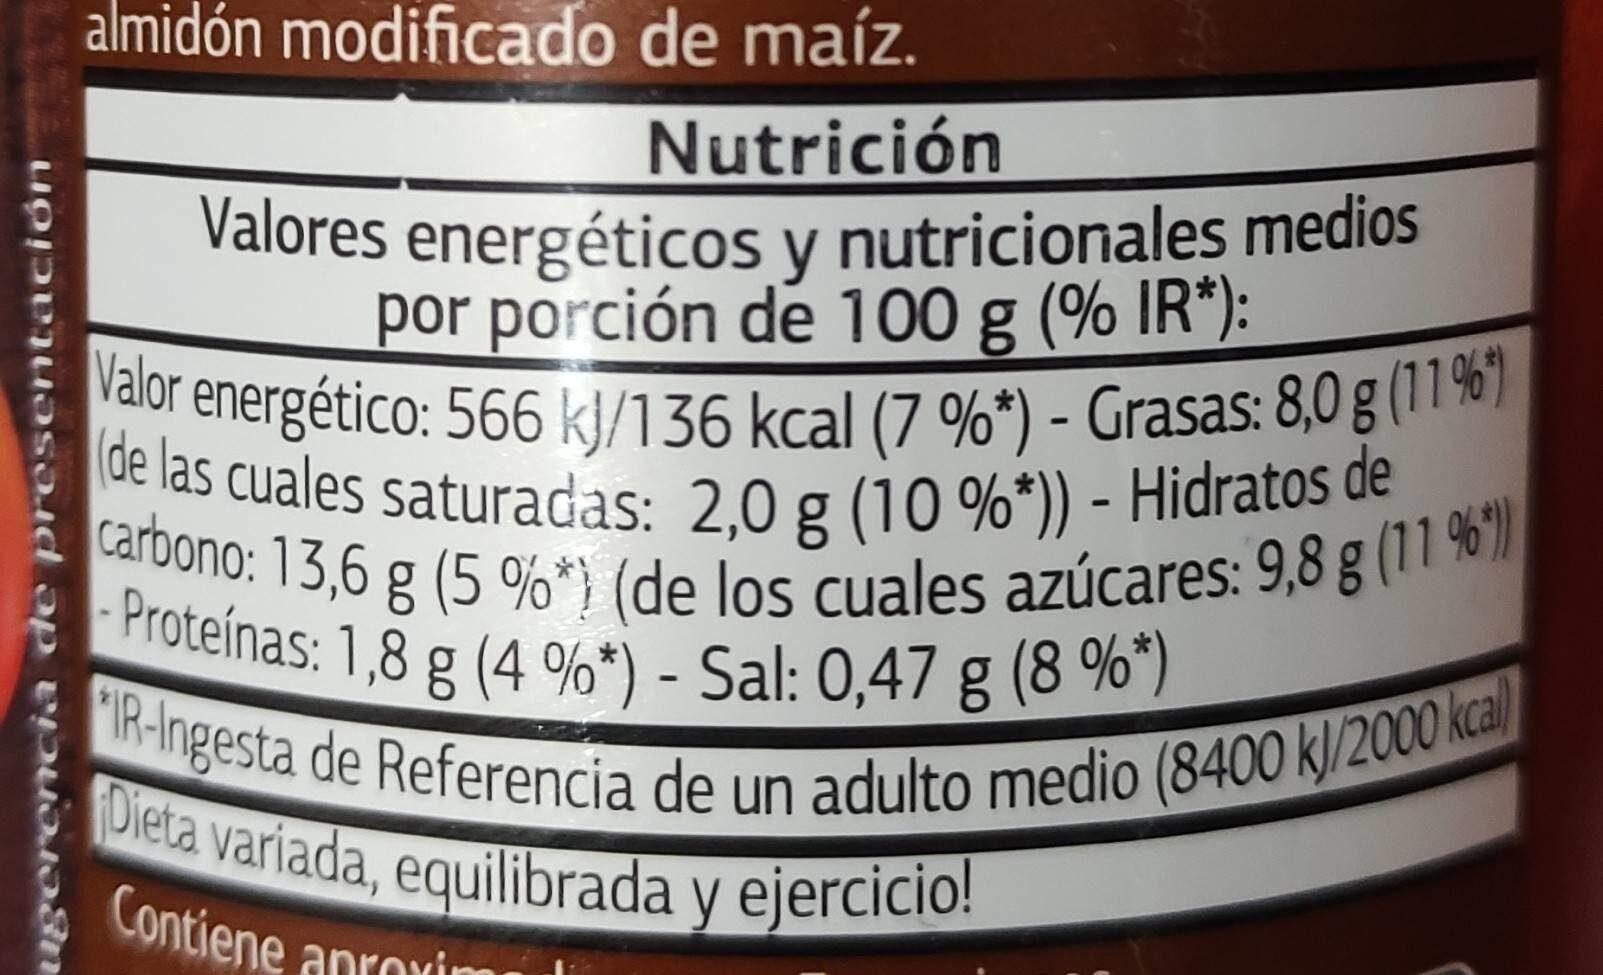 Tomate frito casero - Nutrition facts - es